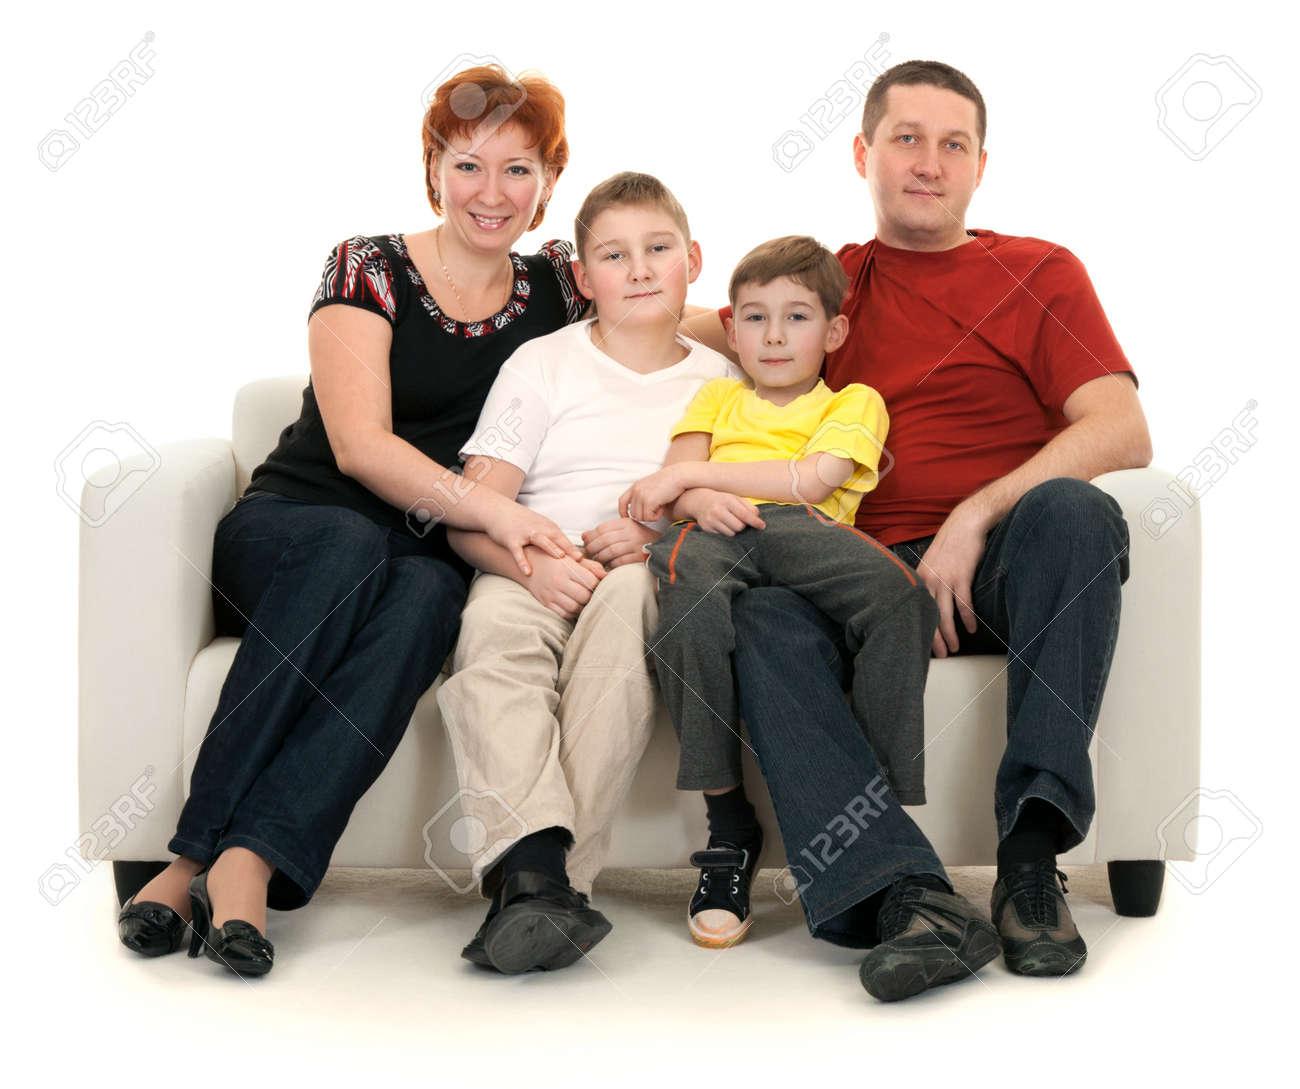 Family of four on a sofa on a white background Stock Photo - 8590375